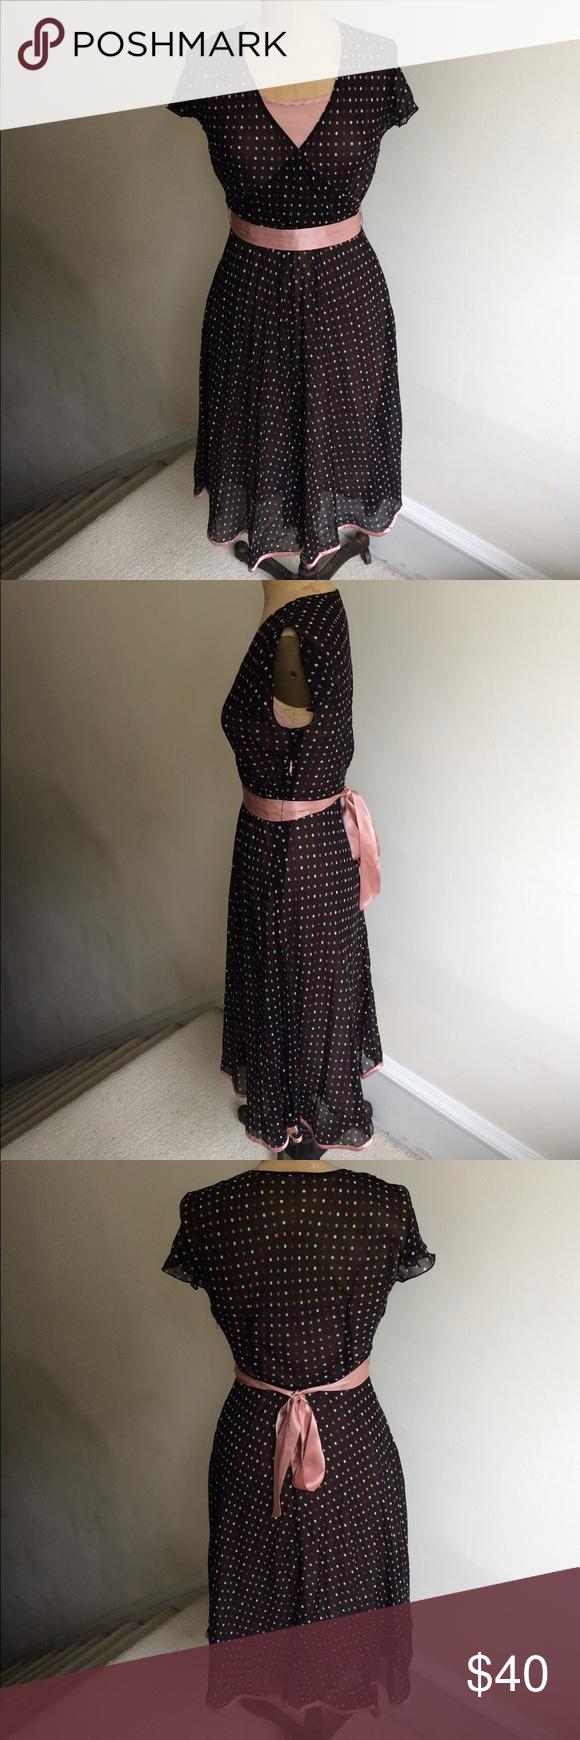 Lordutaylor pink and black polka dot dress euc beautiful dress by